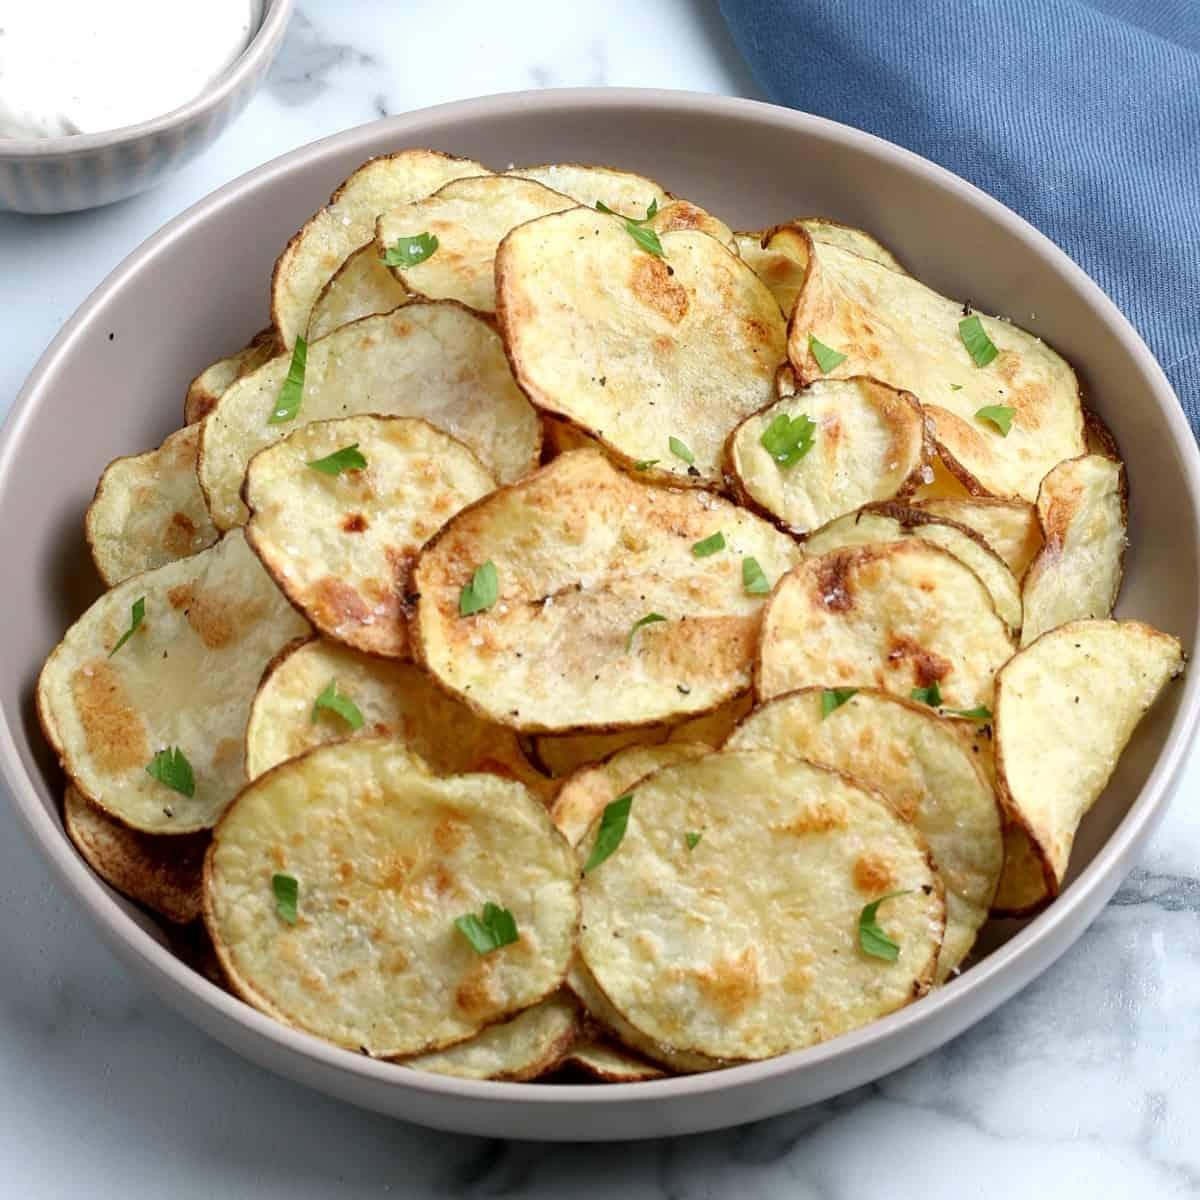 Tilted bowl filled with fried vegetable snacks.